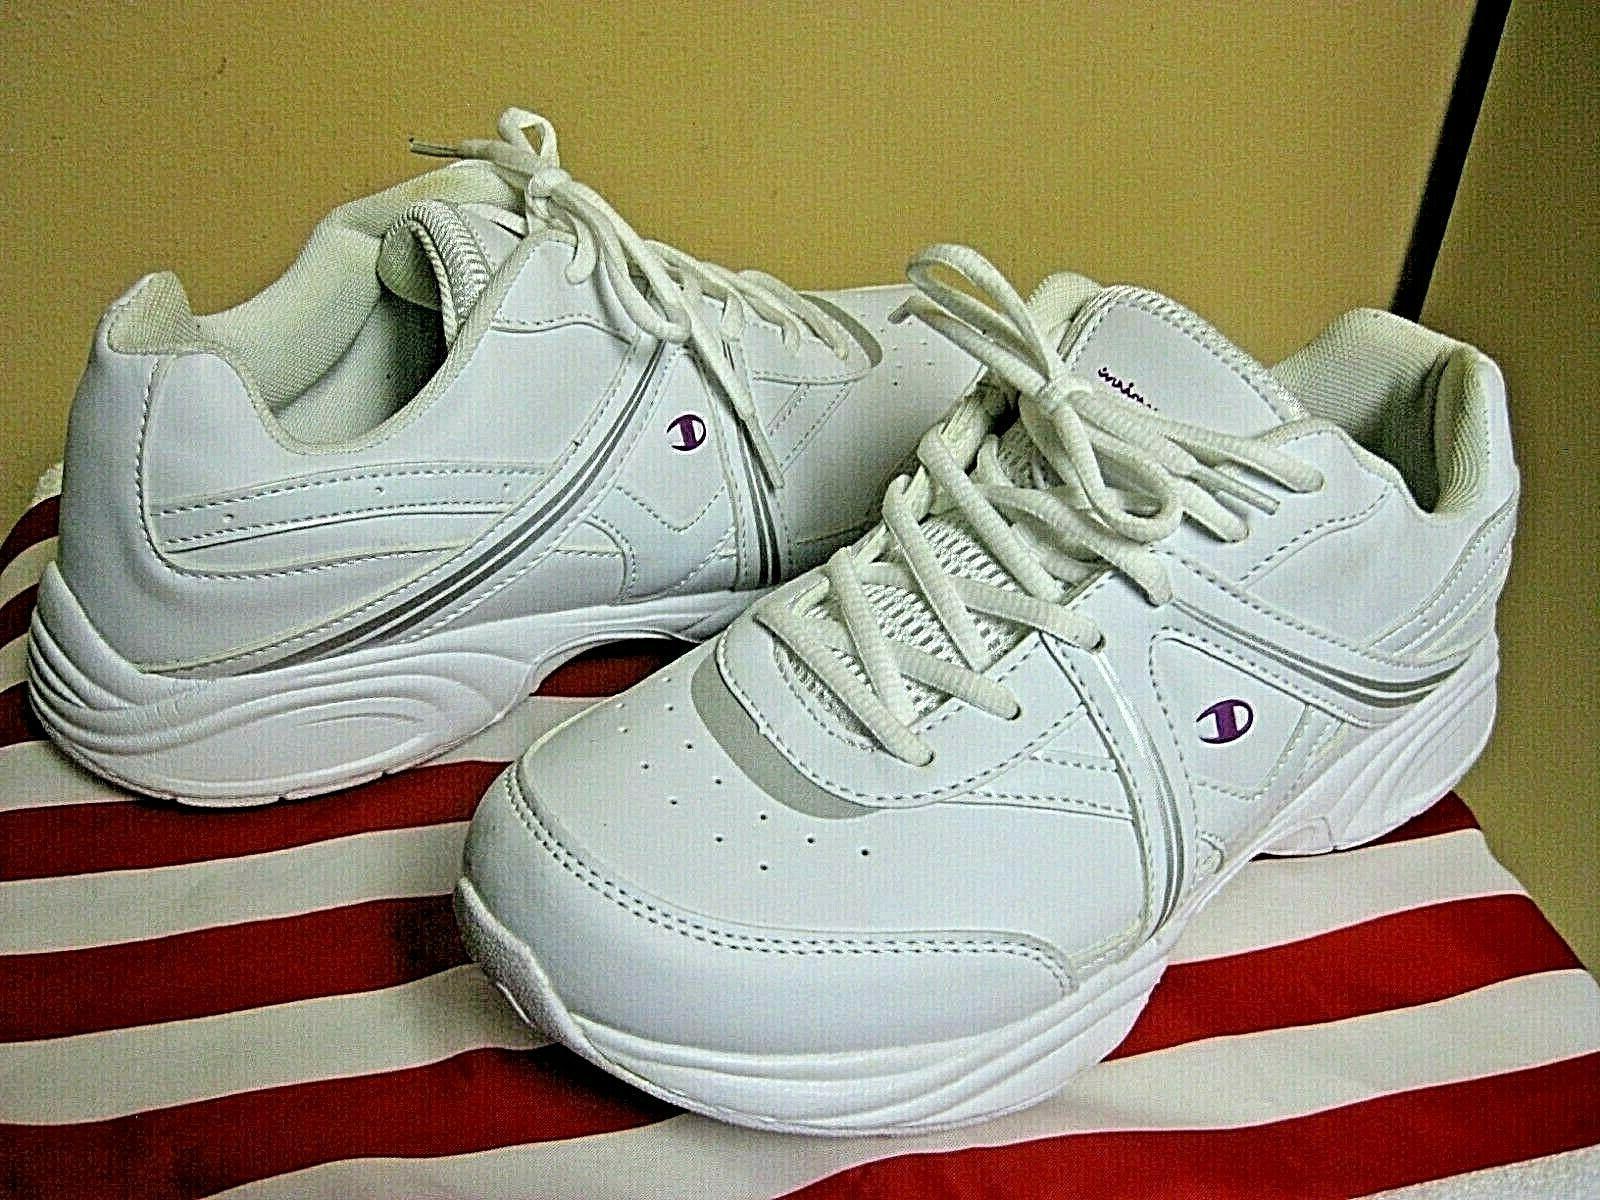 CHAMPION White Sneakers Walking Tennis Size 11